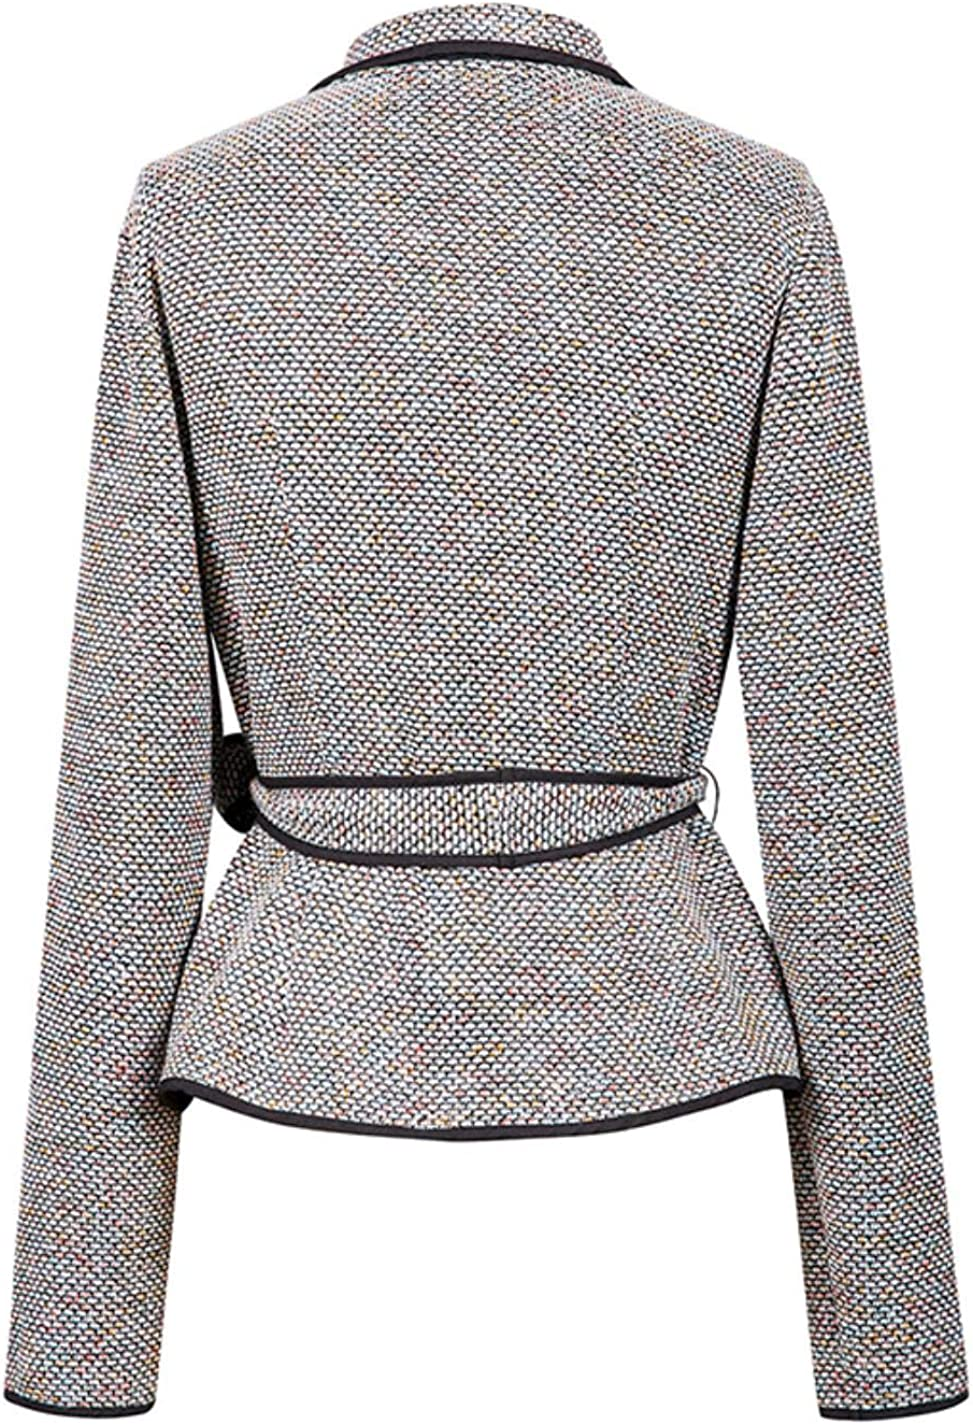 Bibize Women Korean Turn-Down Collar Coat Casual Buttons Sashes Autumn Short